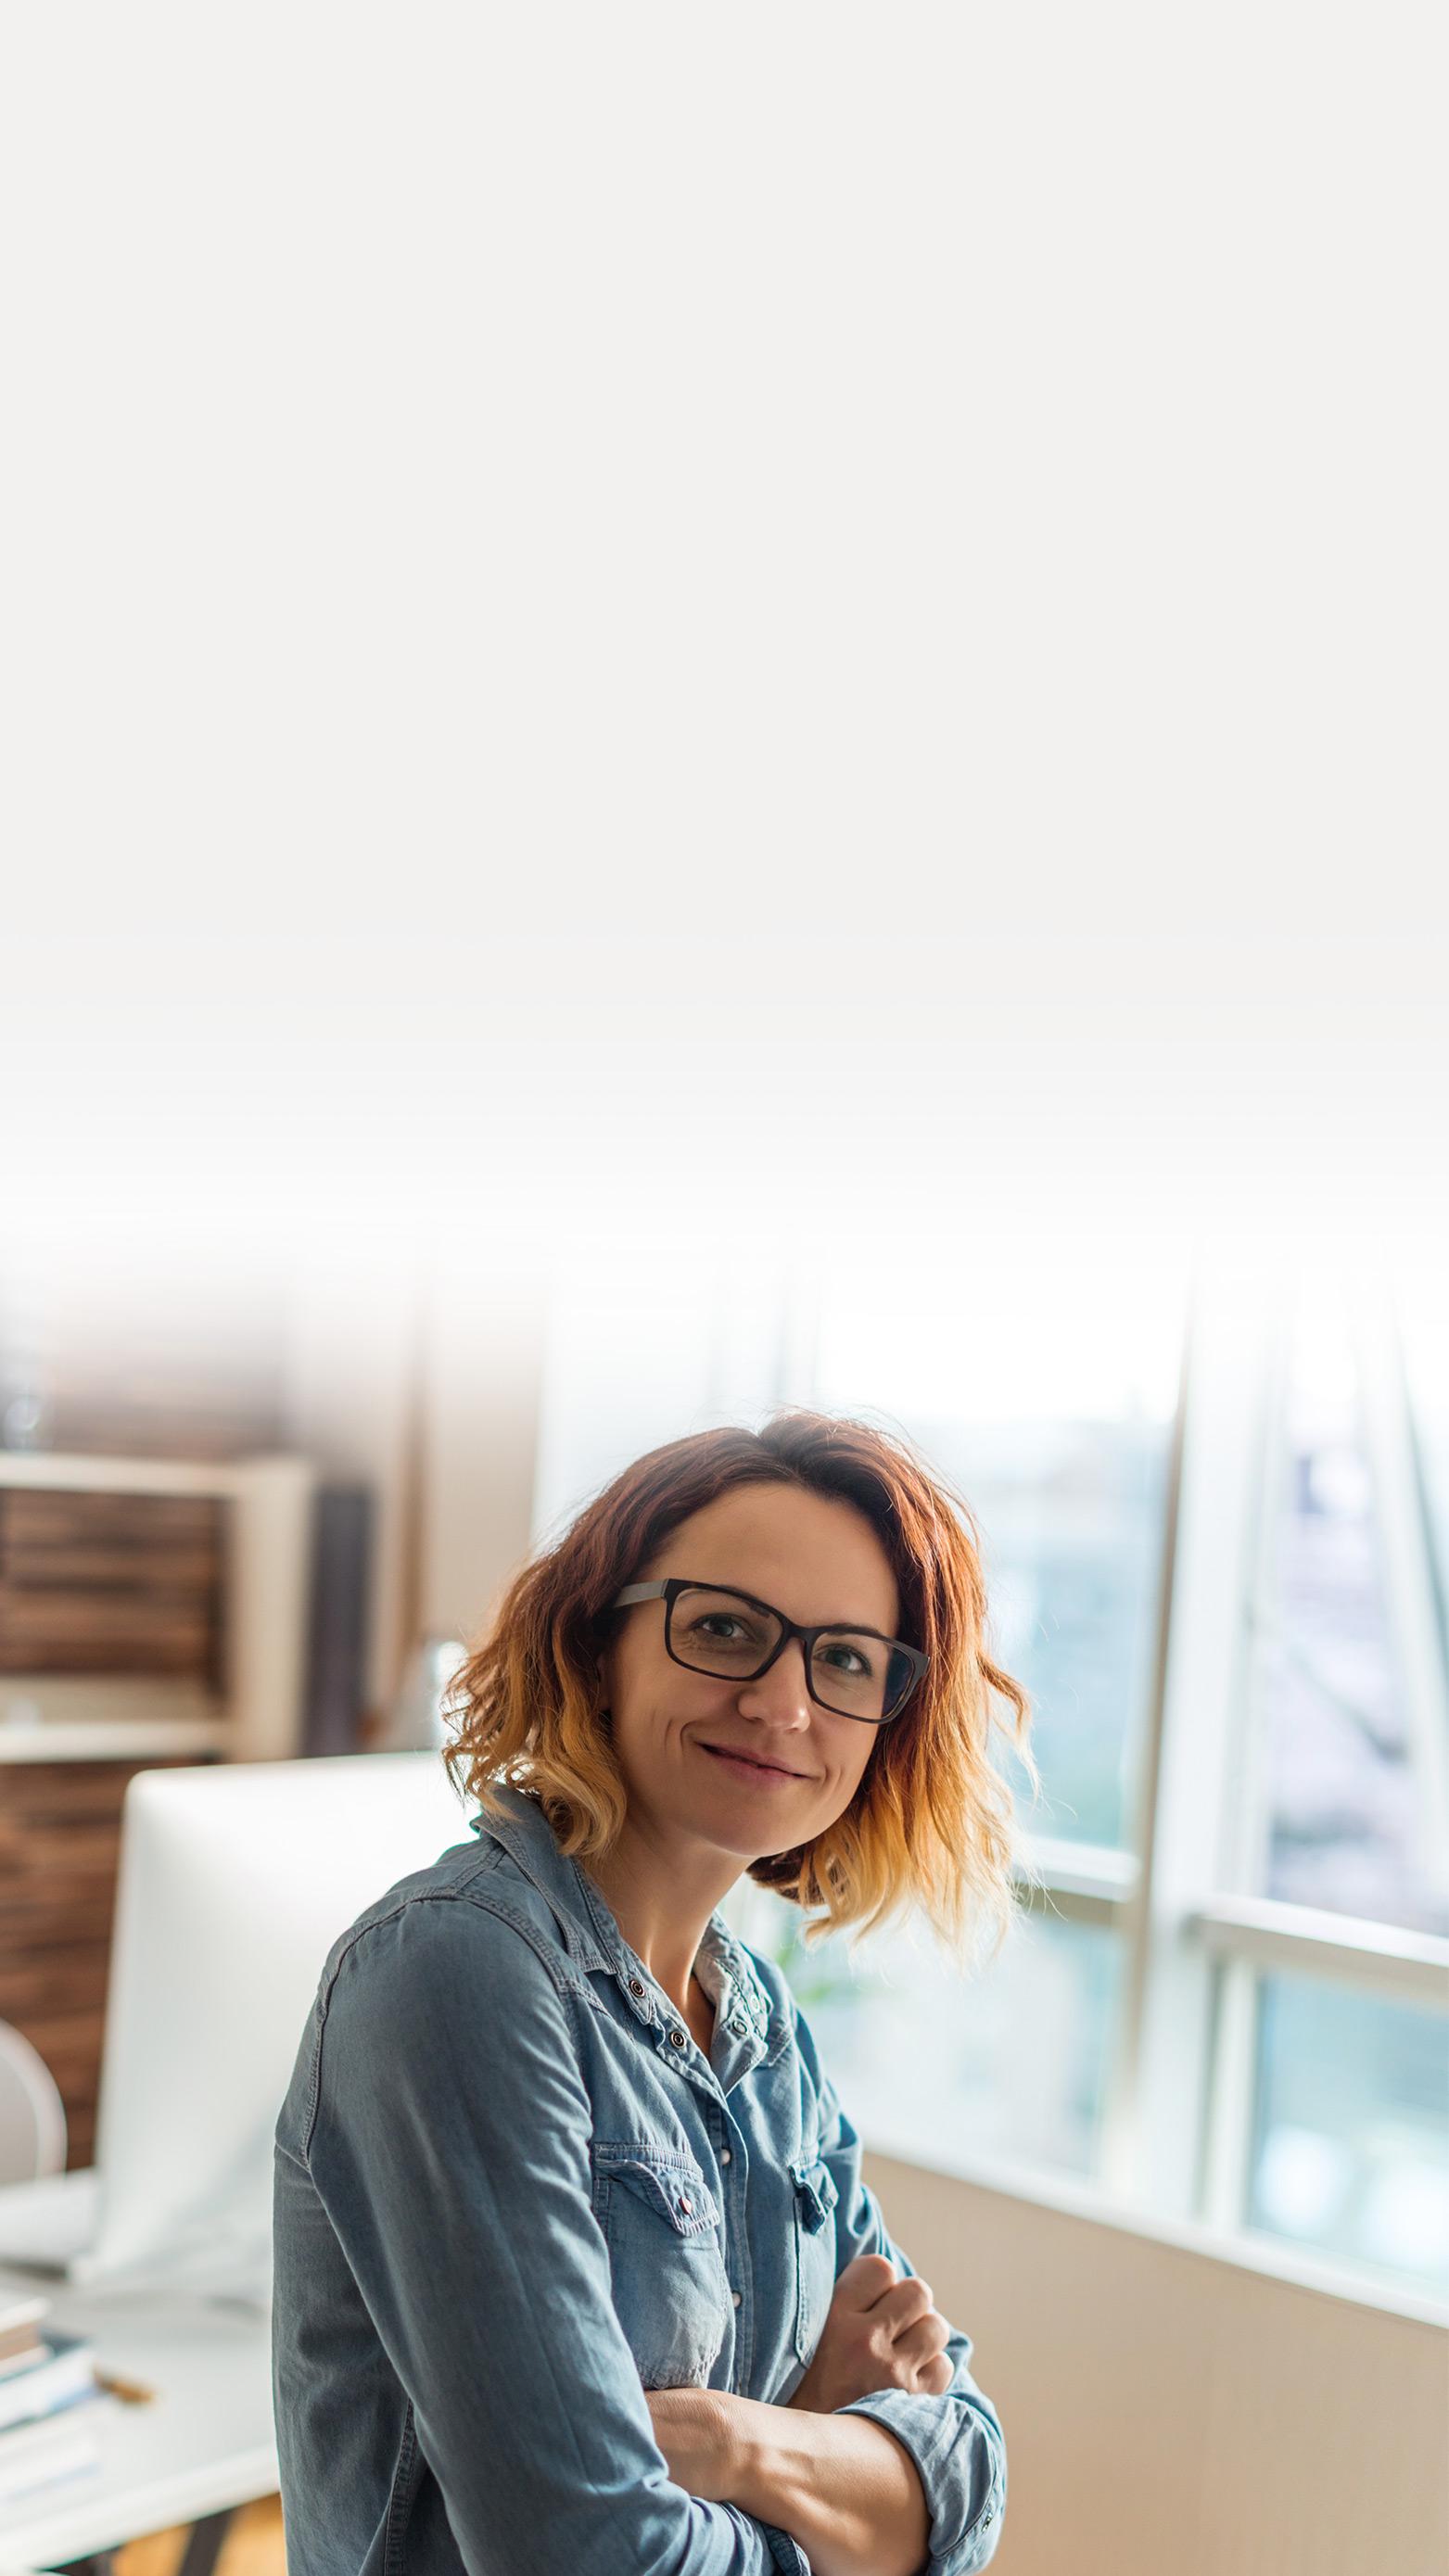 banca intesa home page small business loans